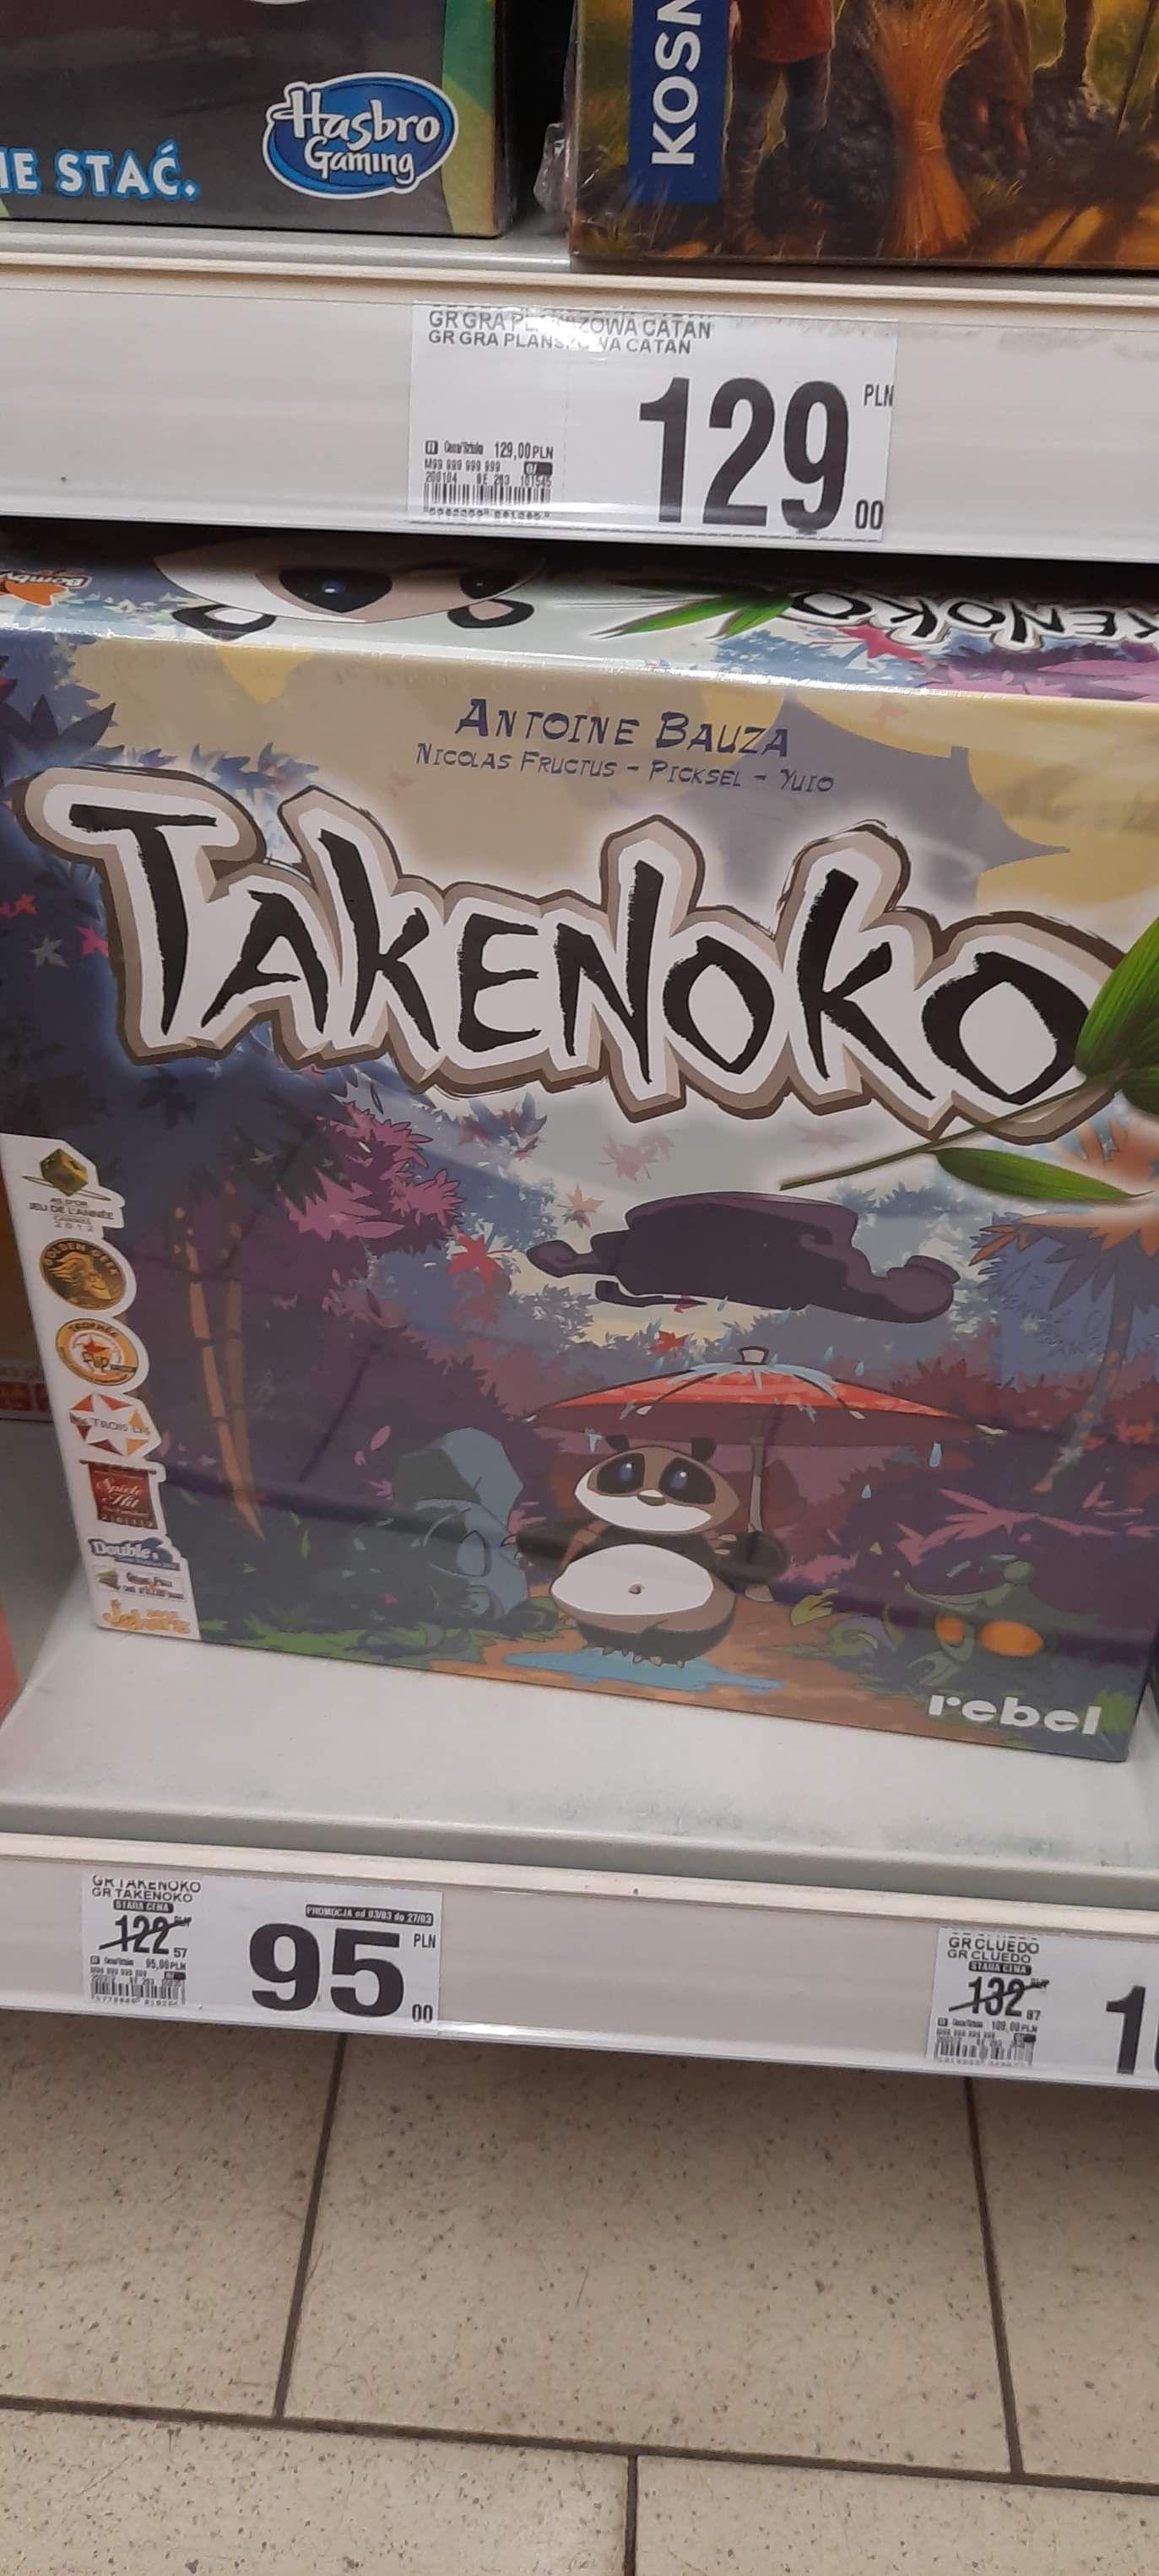 Gra planszowa Takenoko Rebel @ B1 Legnica